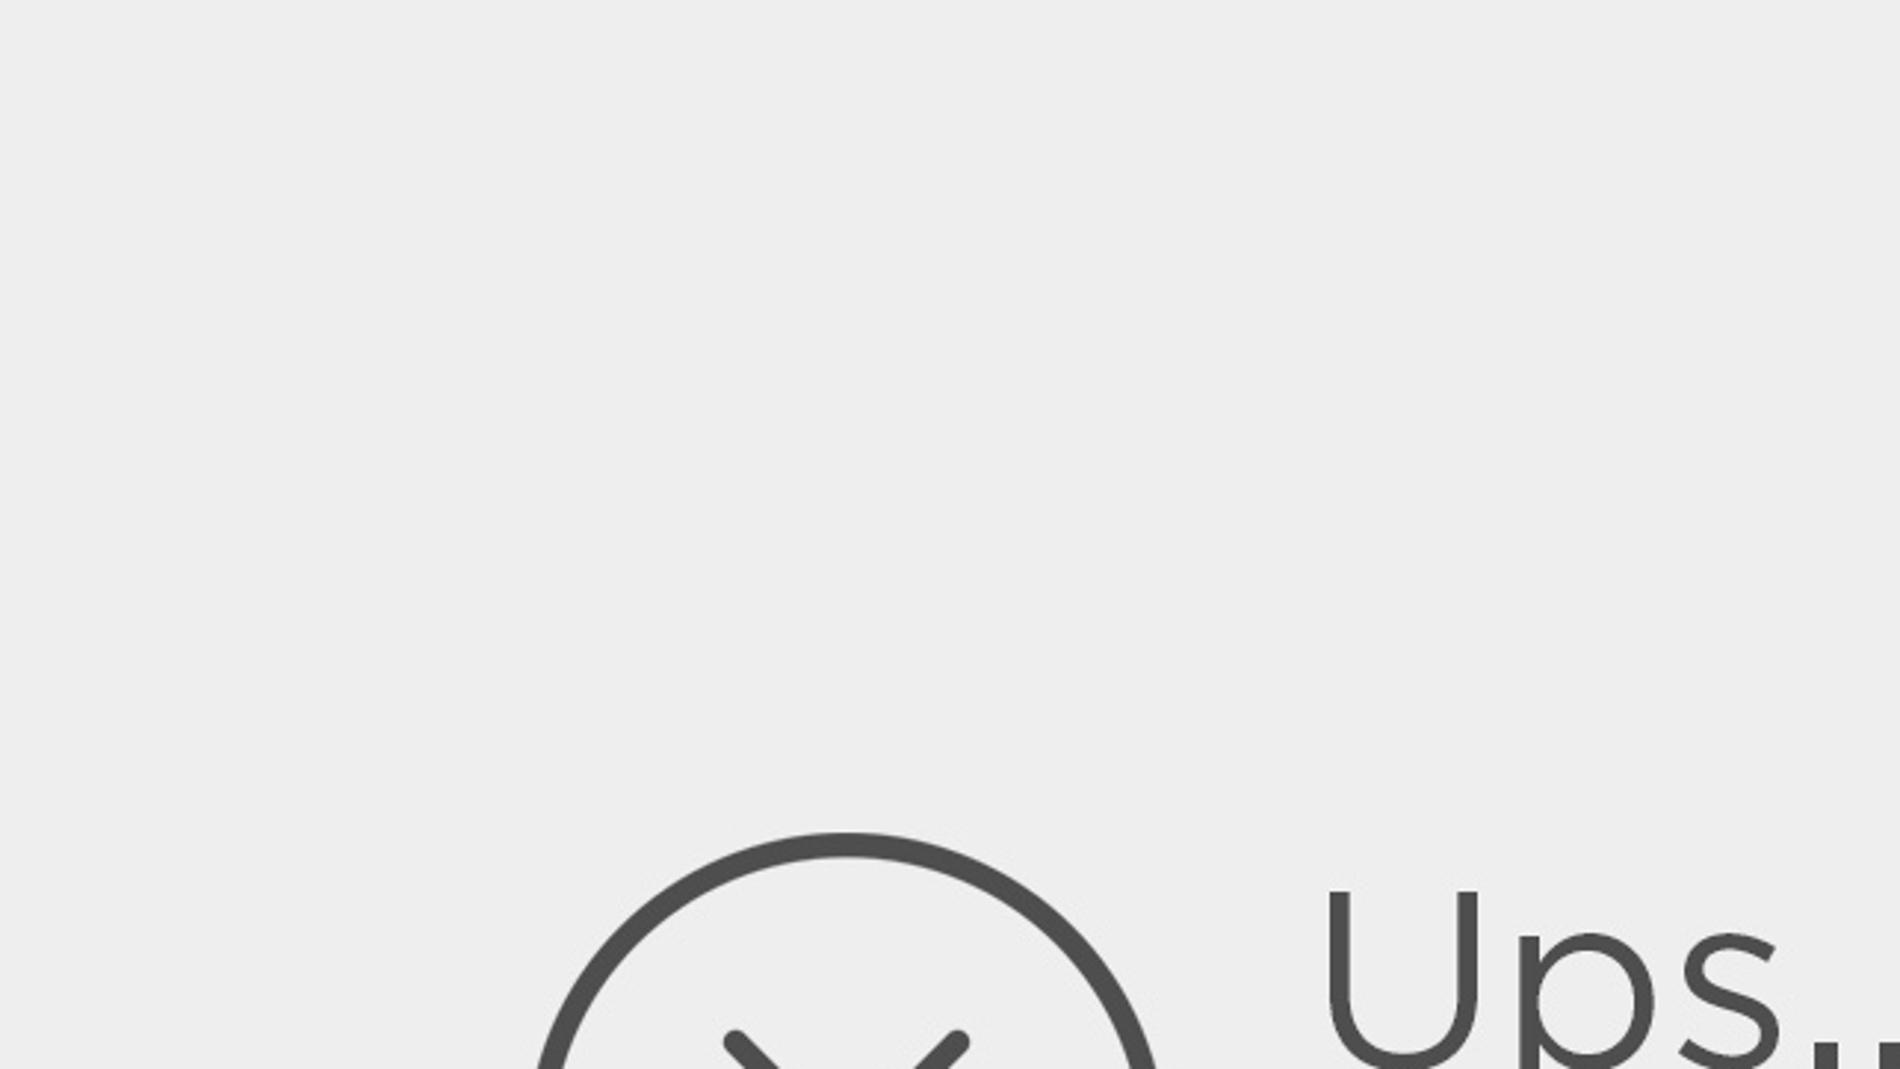 Guillermo del Toro, que dice parecerse a Jabba el Hutt